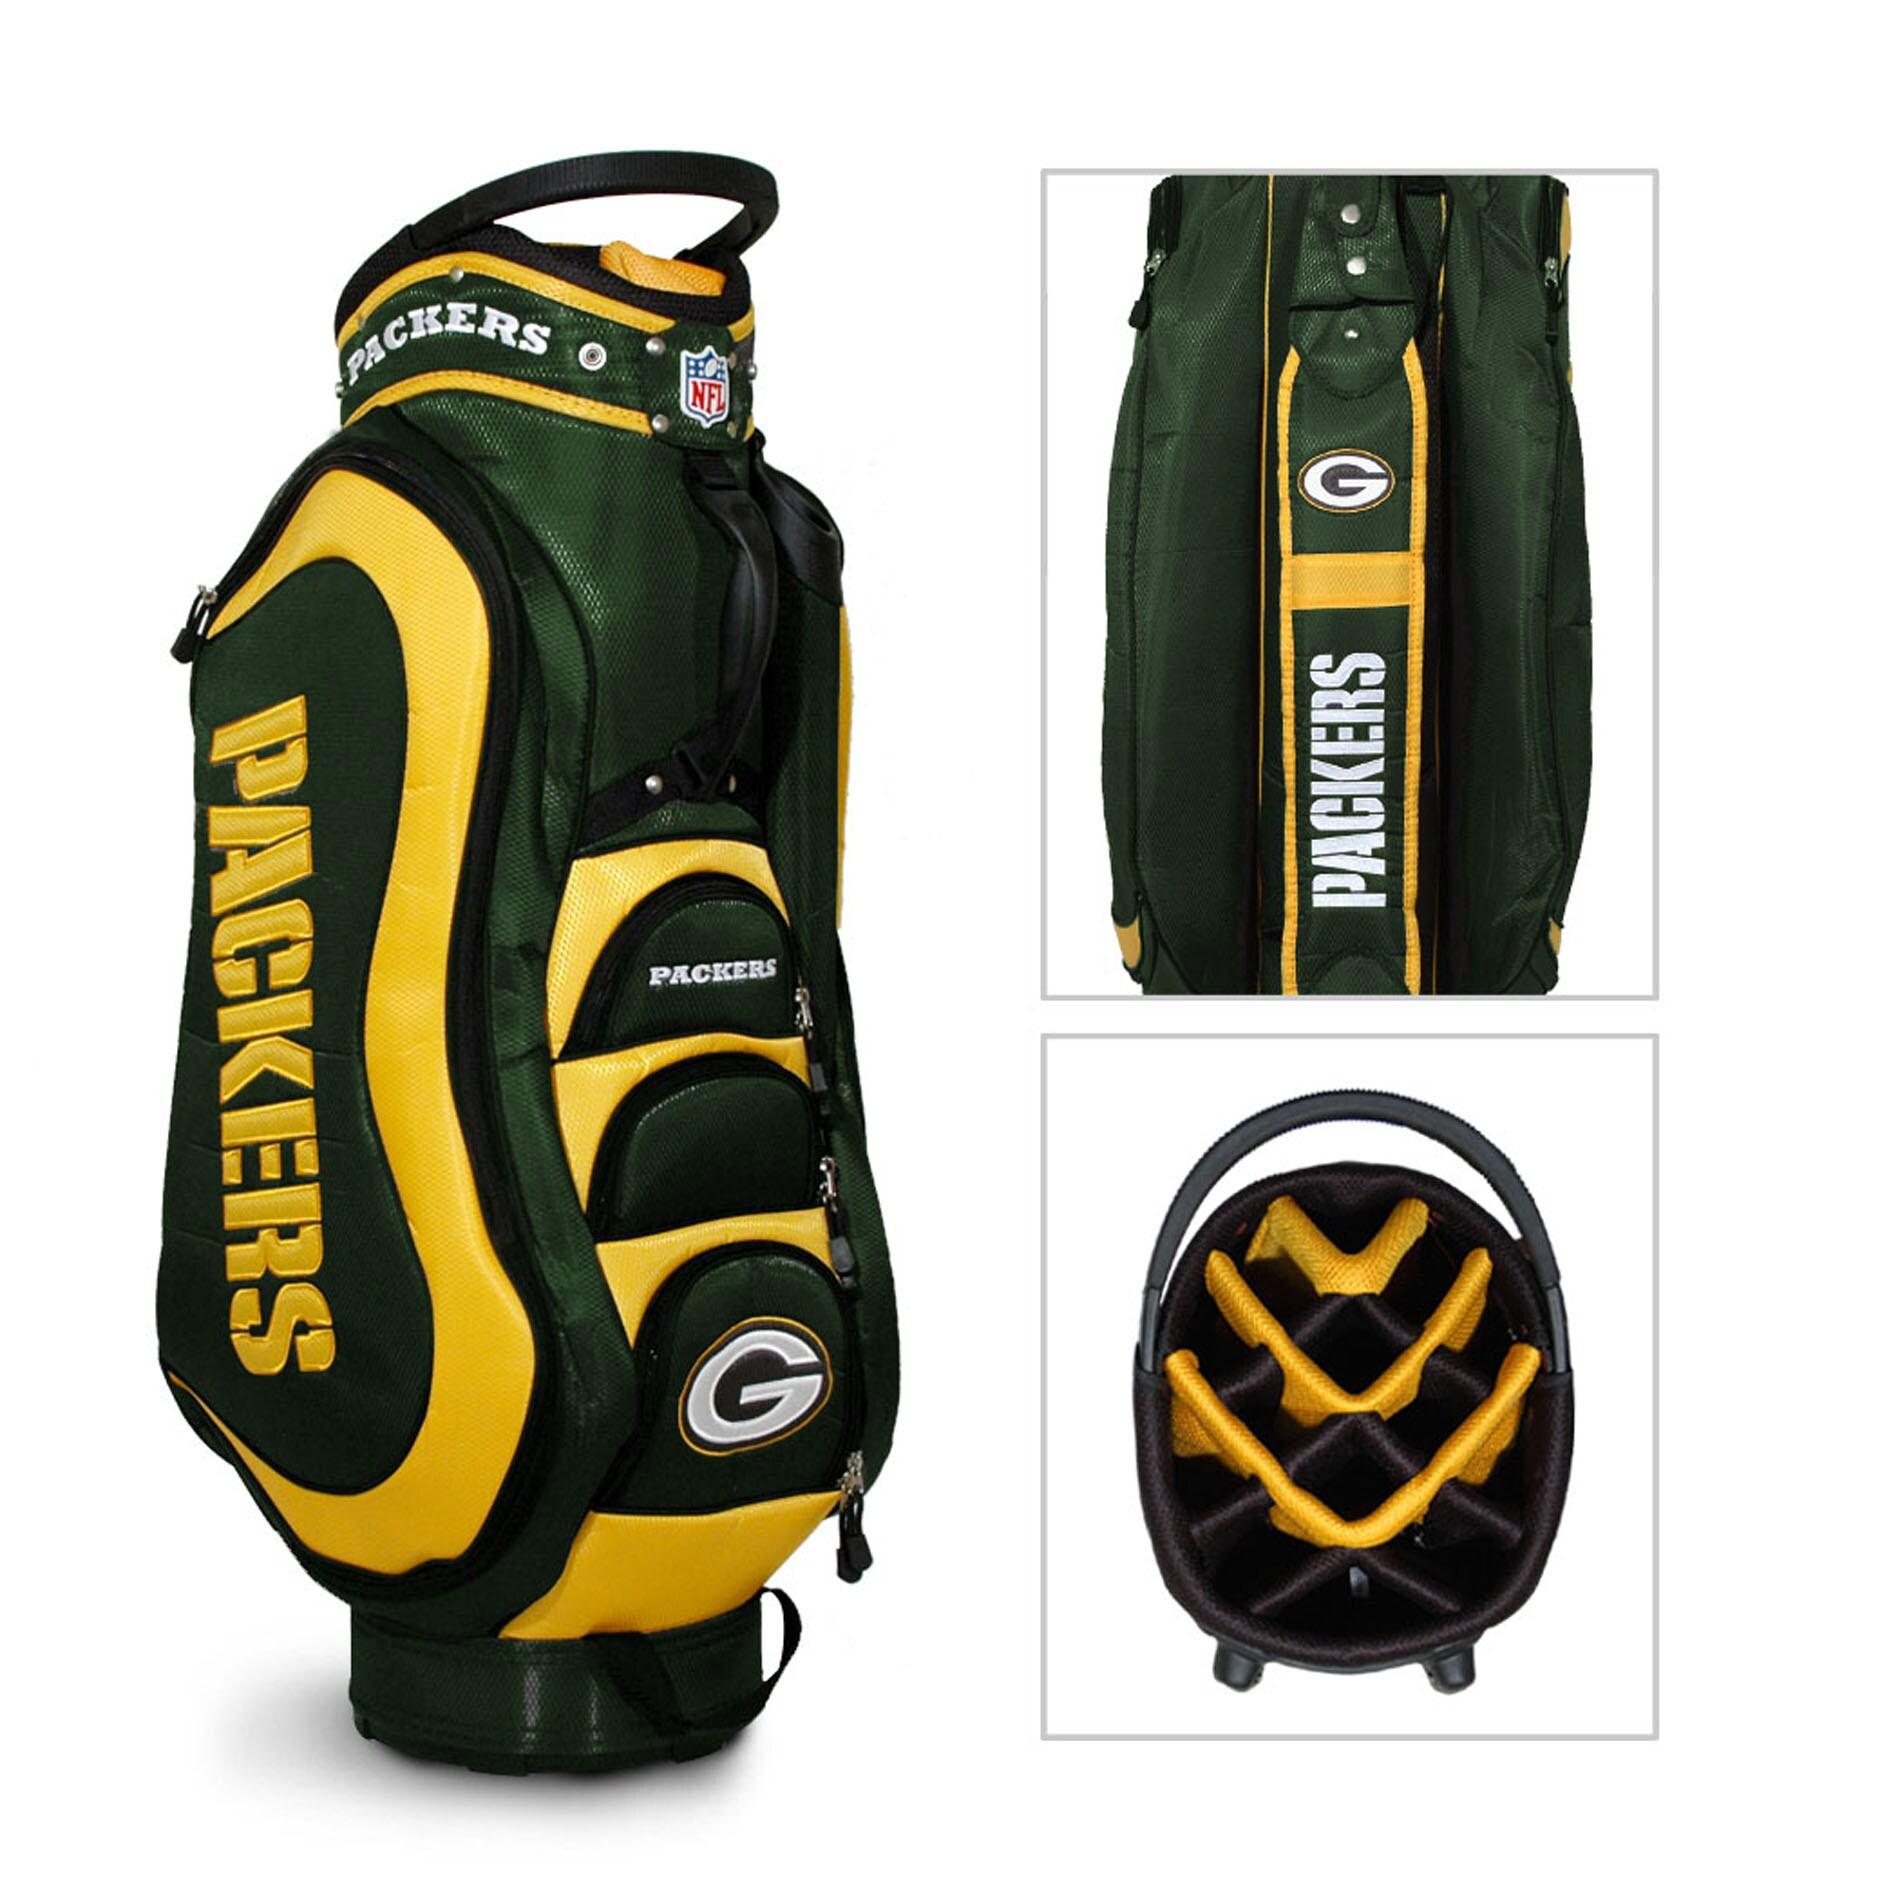 Green Bay Packers NFL Medalist Cart Golf Bag